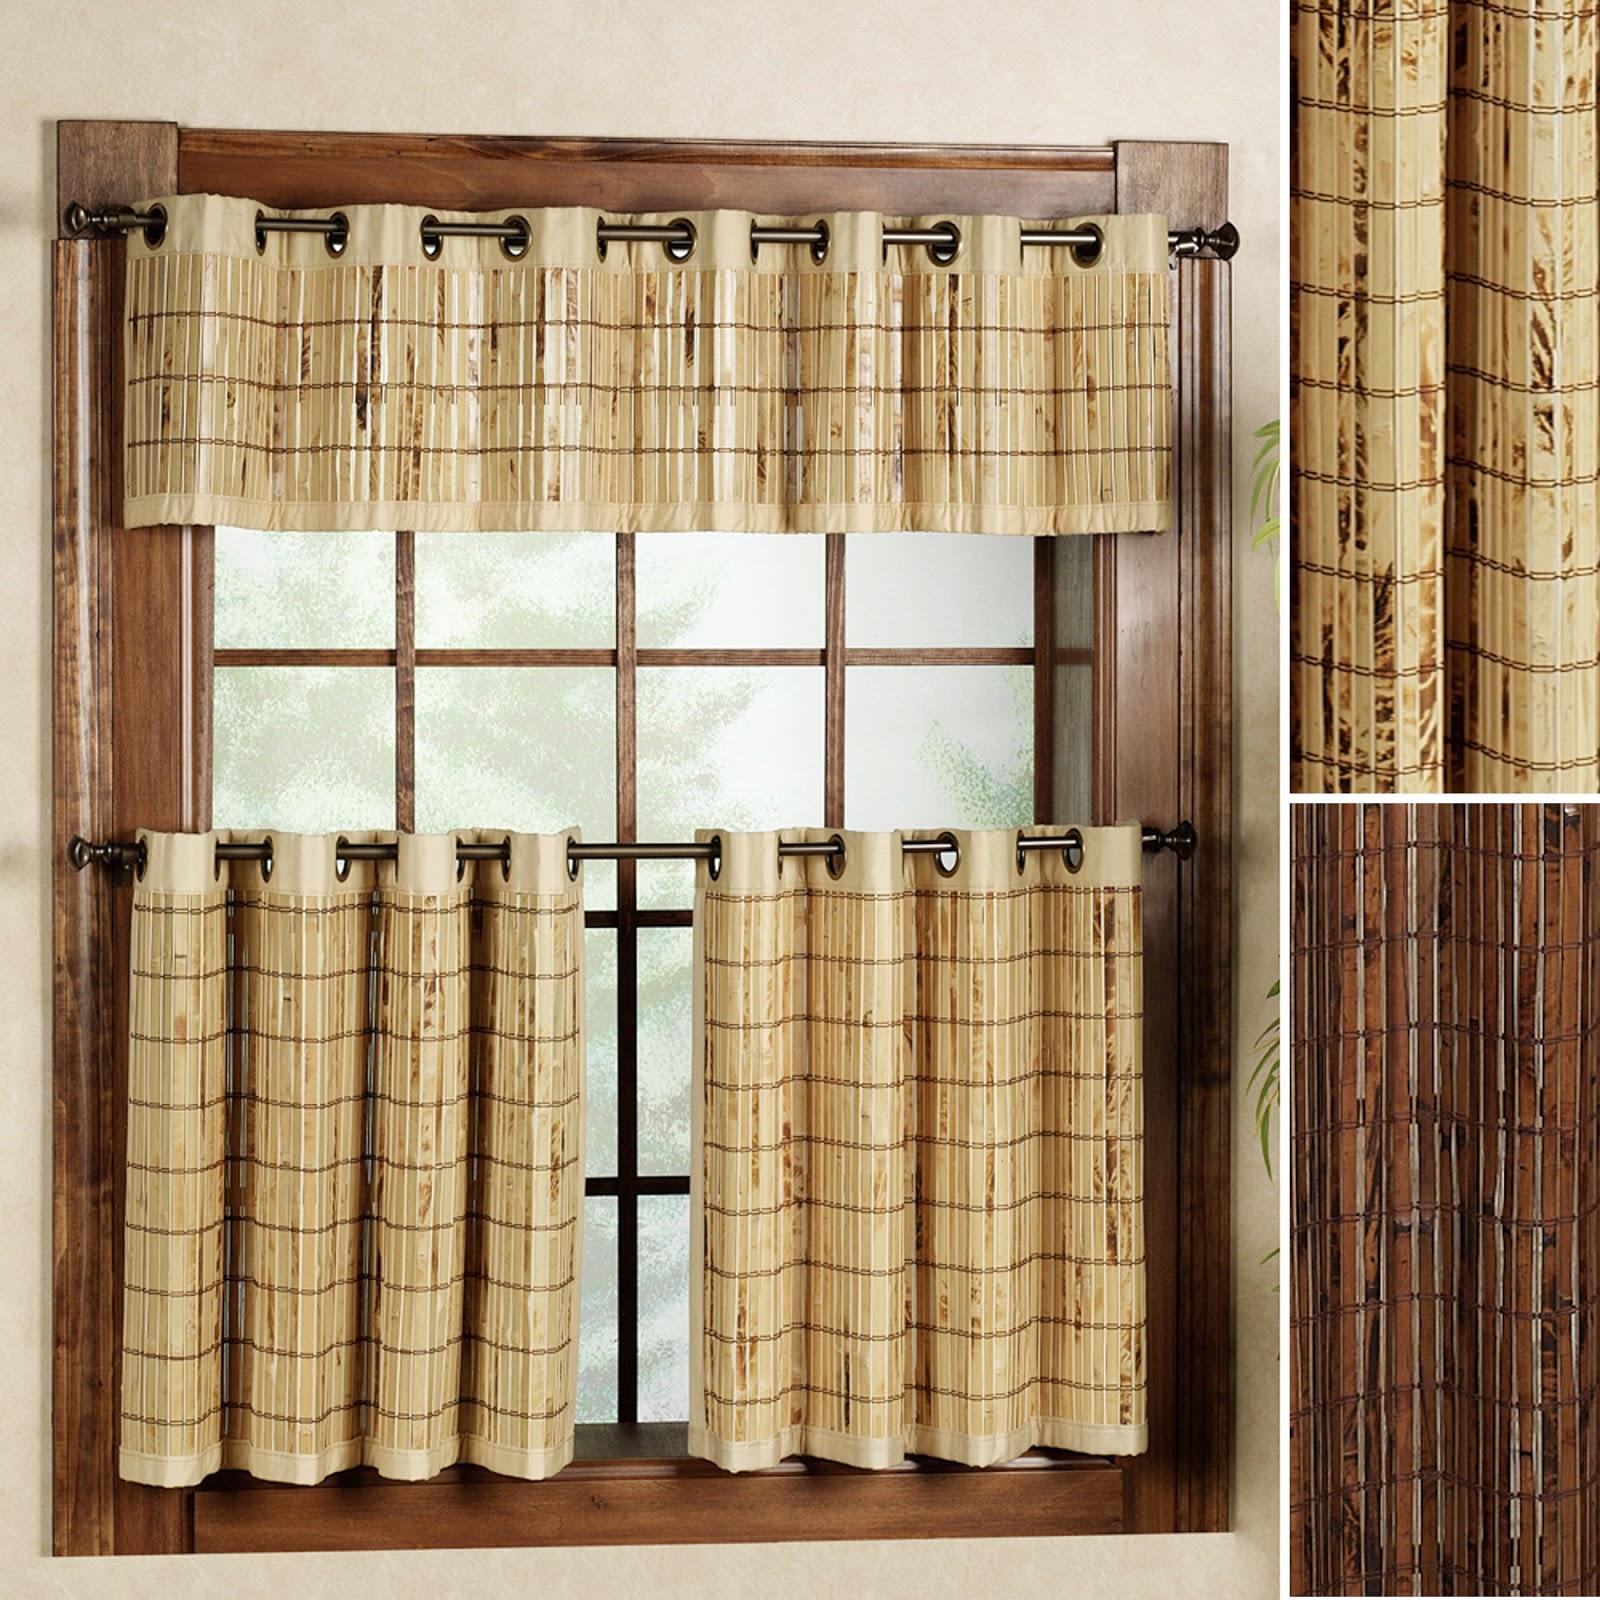 Bamboo worktops photos bamboo window treatments - Cortina de bambu ...